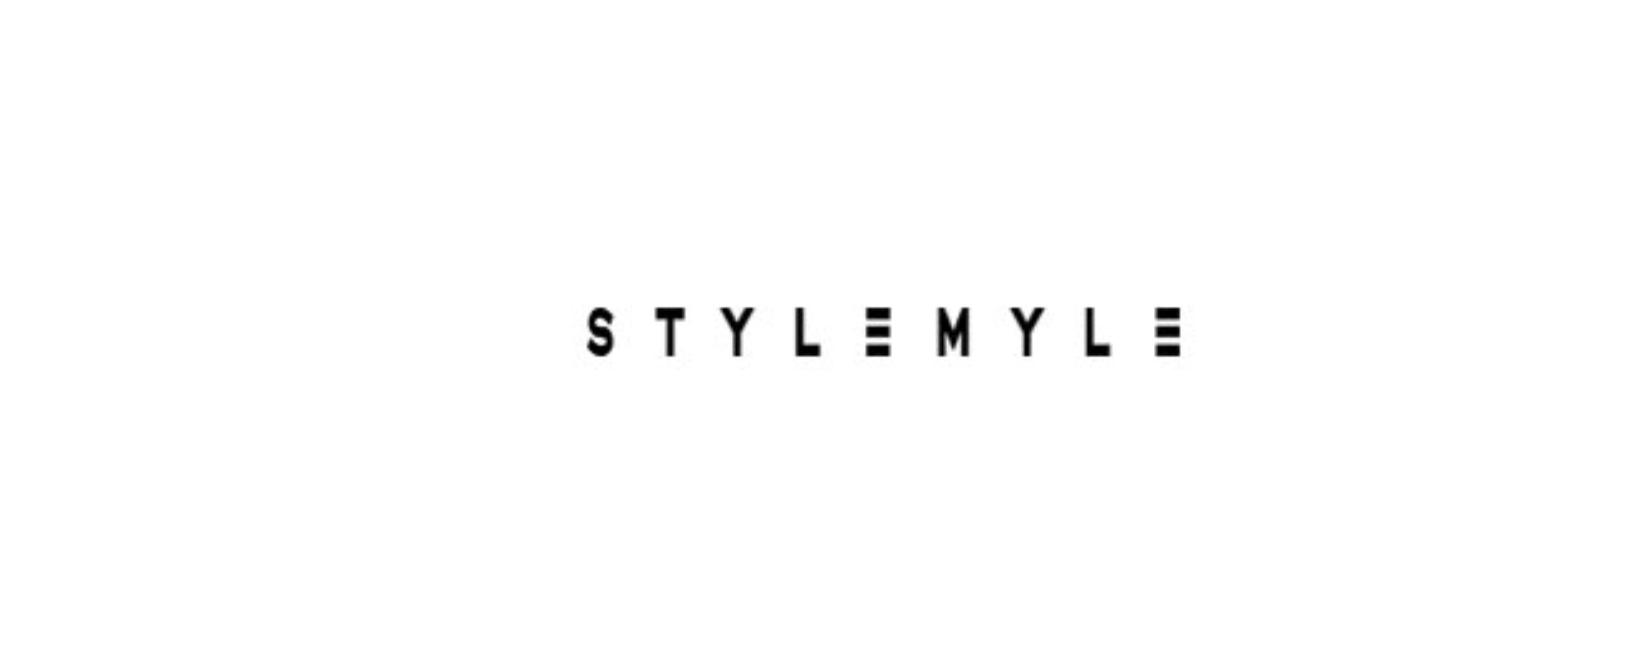 Stylemyle Discount Code 2021